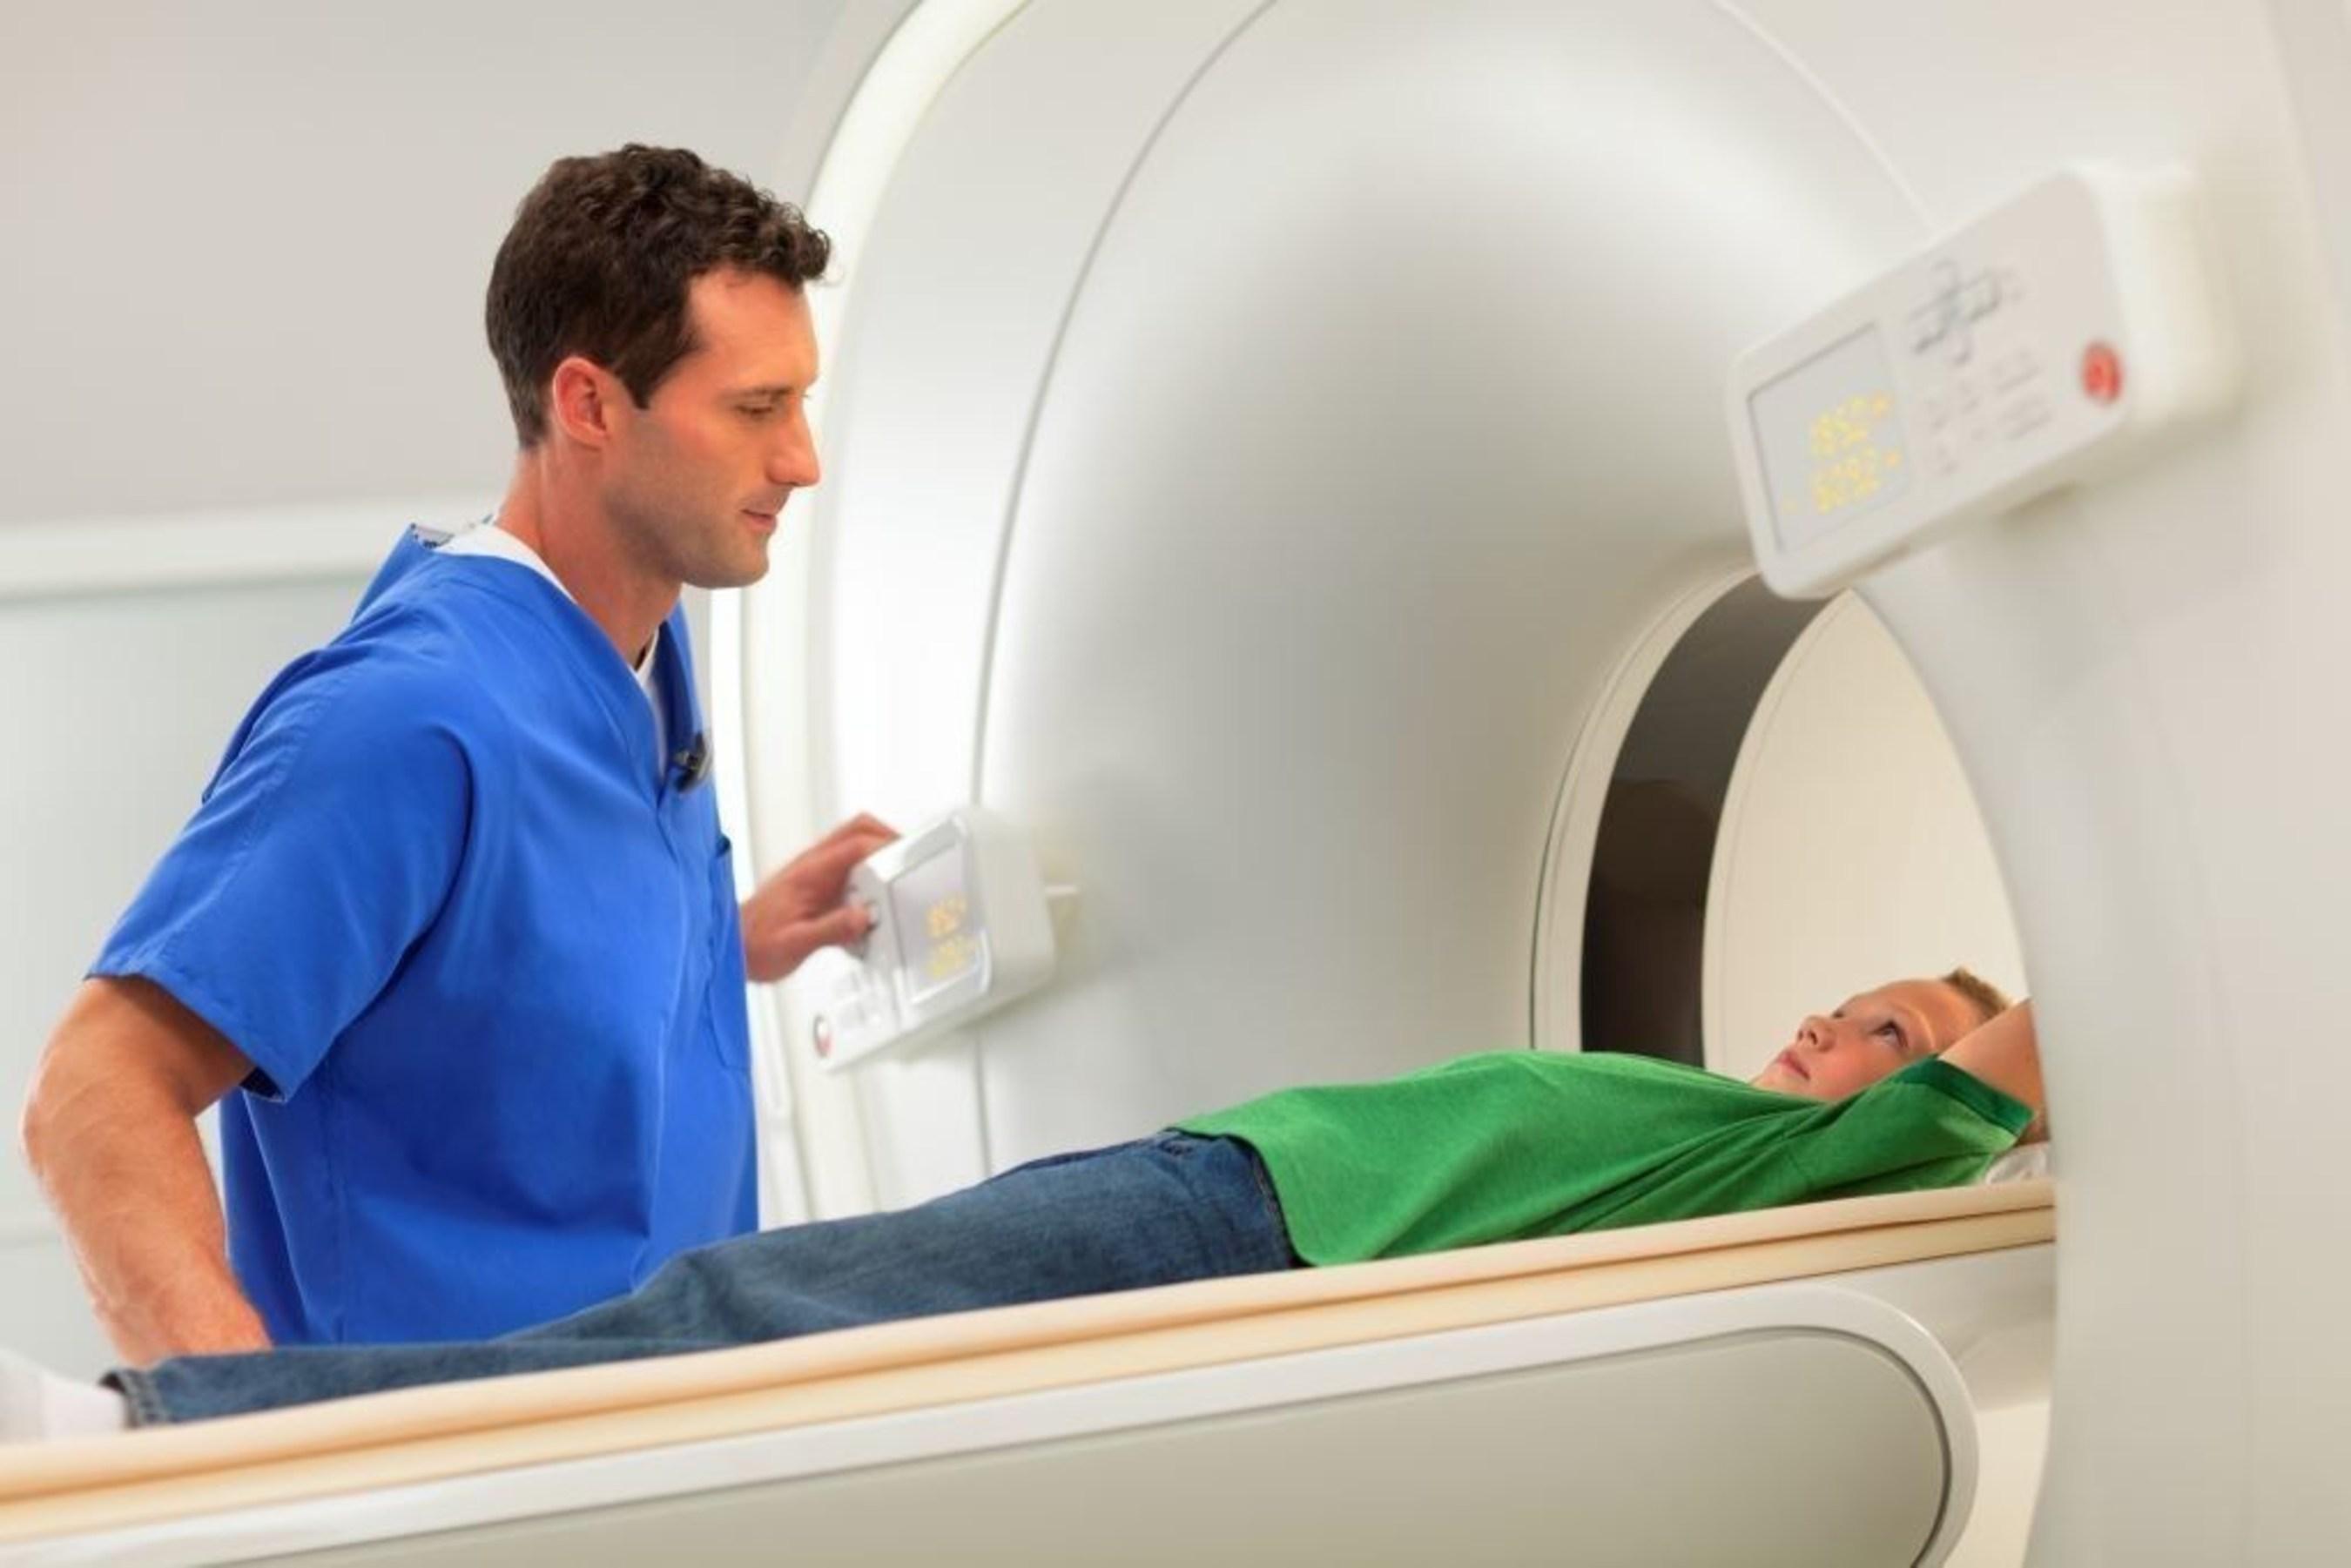 Pediatric scan on Vereos digital PET/CT.